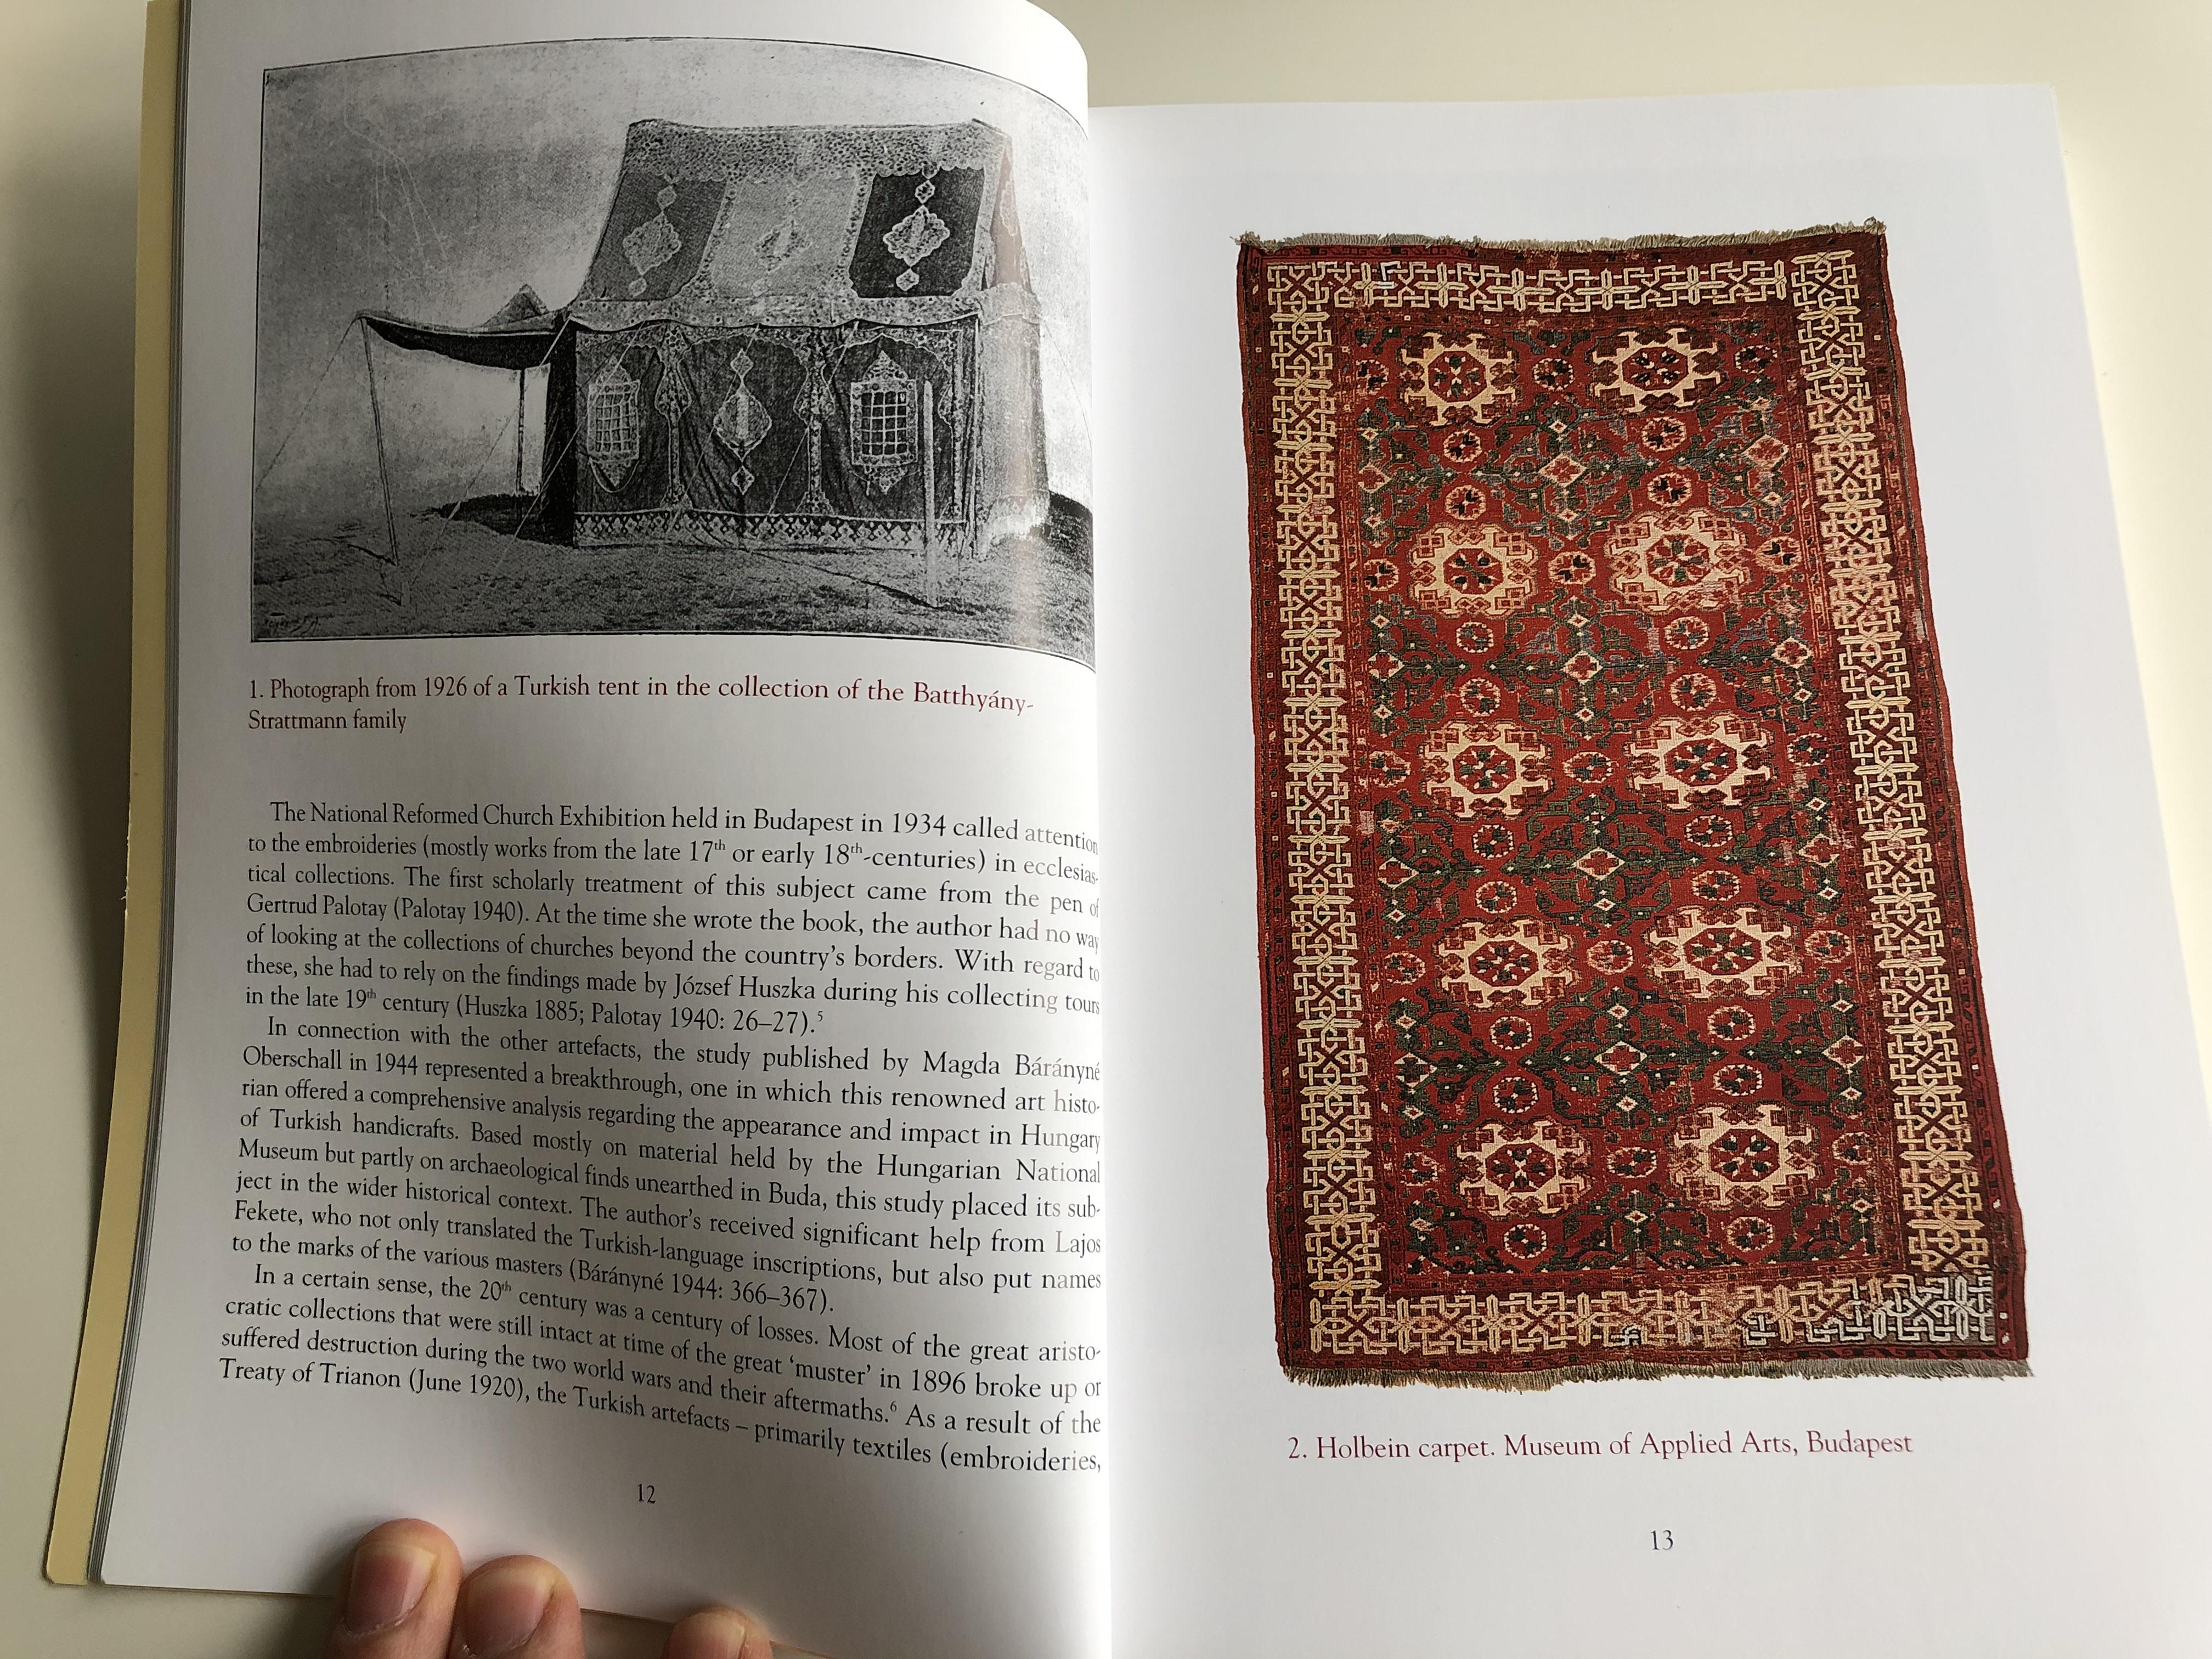 turkish-flowers-studies-on-ottoman-art-in-hungary-hungarian-national-museum-2005-editor-ibolya-gerelyes-7-.jpg